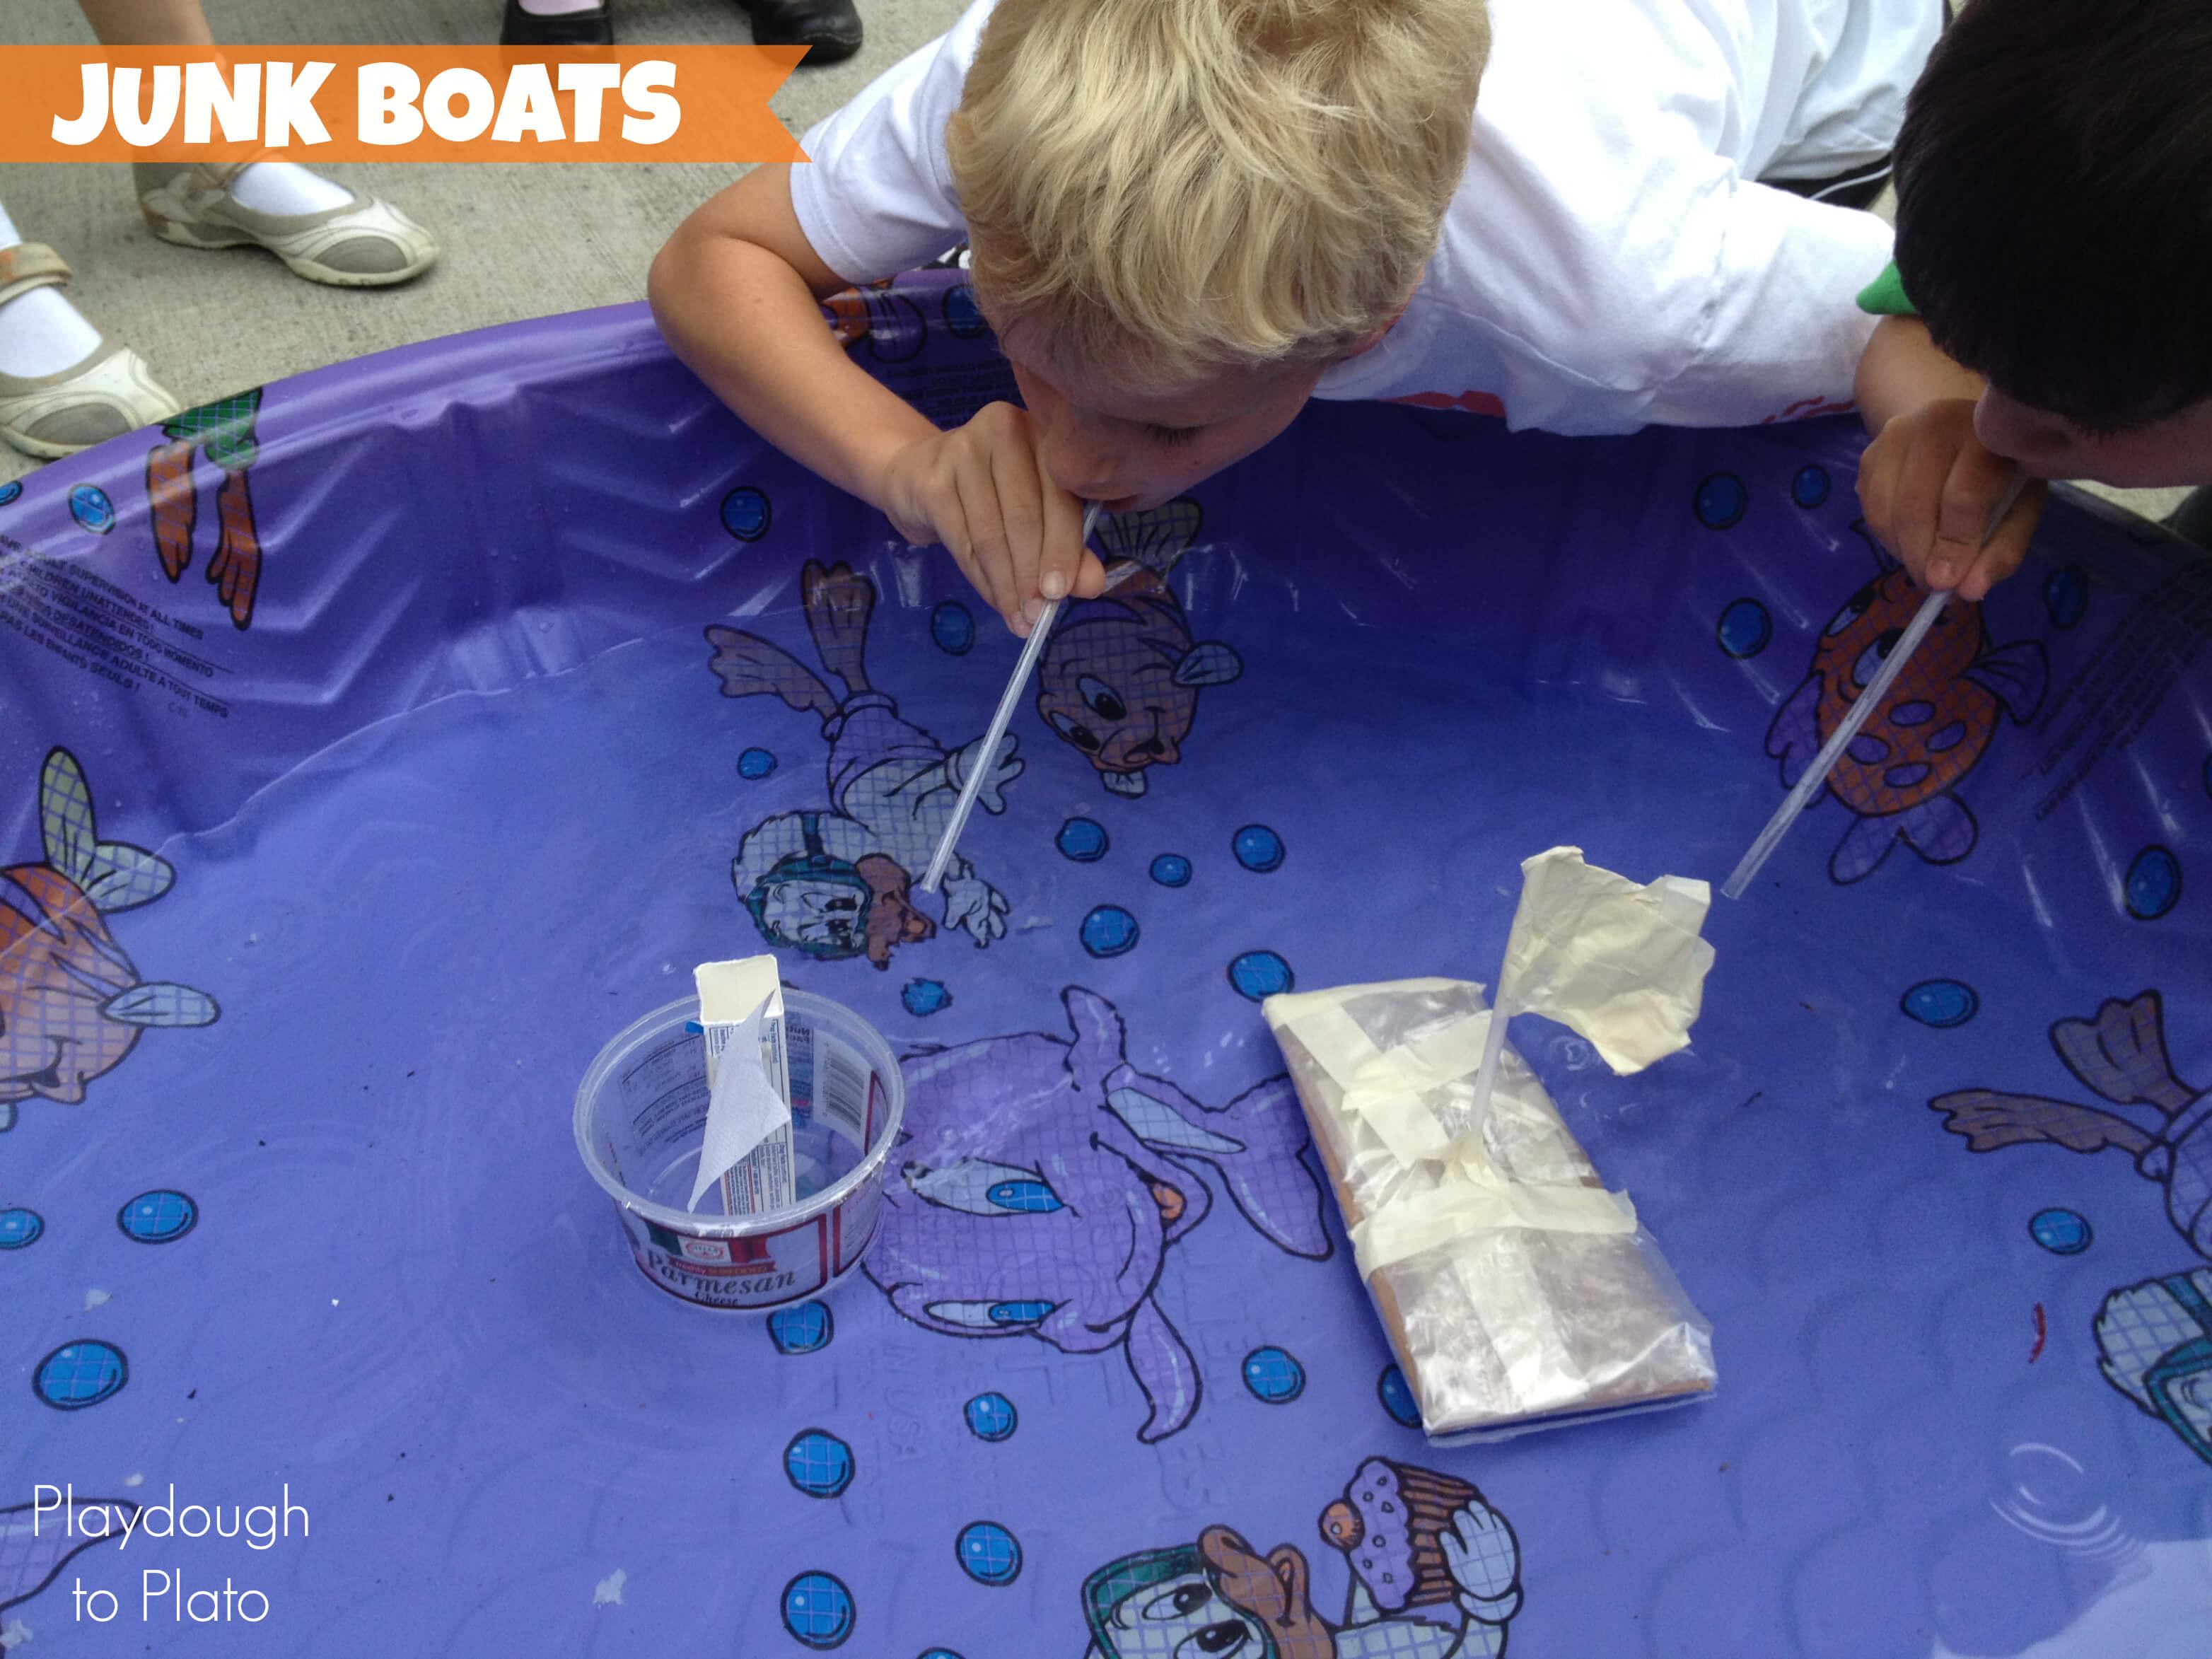 STEM Junk Boats - Playdough To Plato